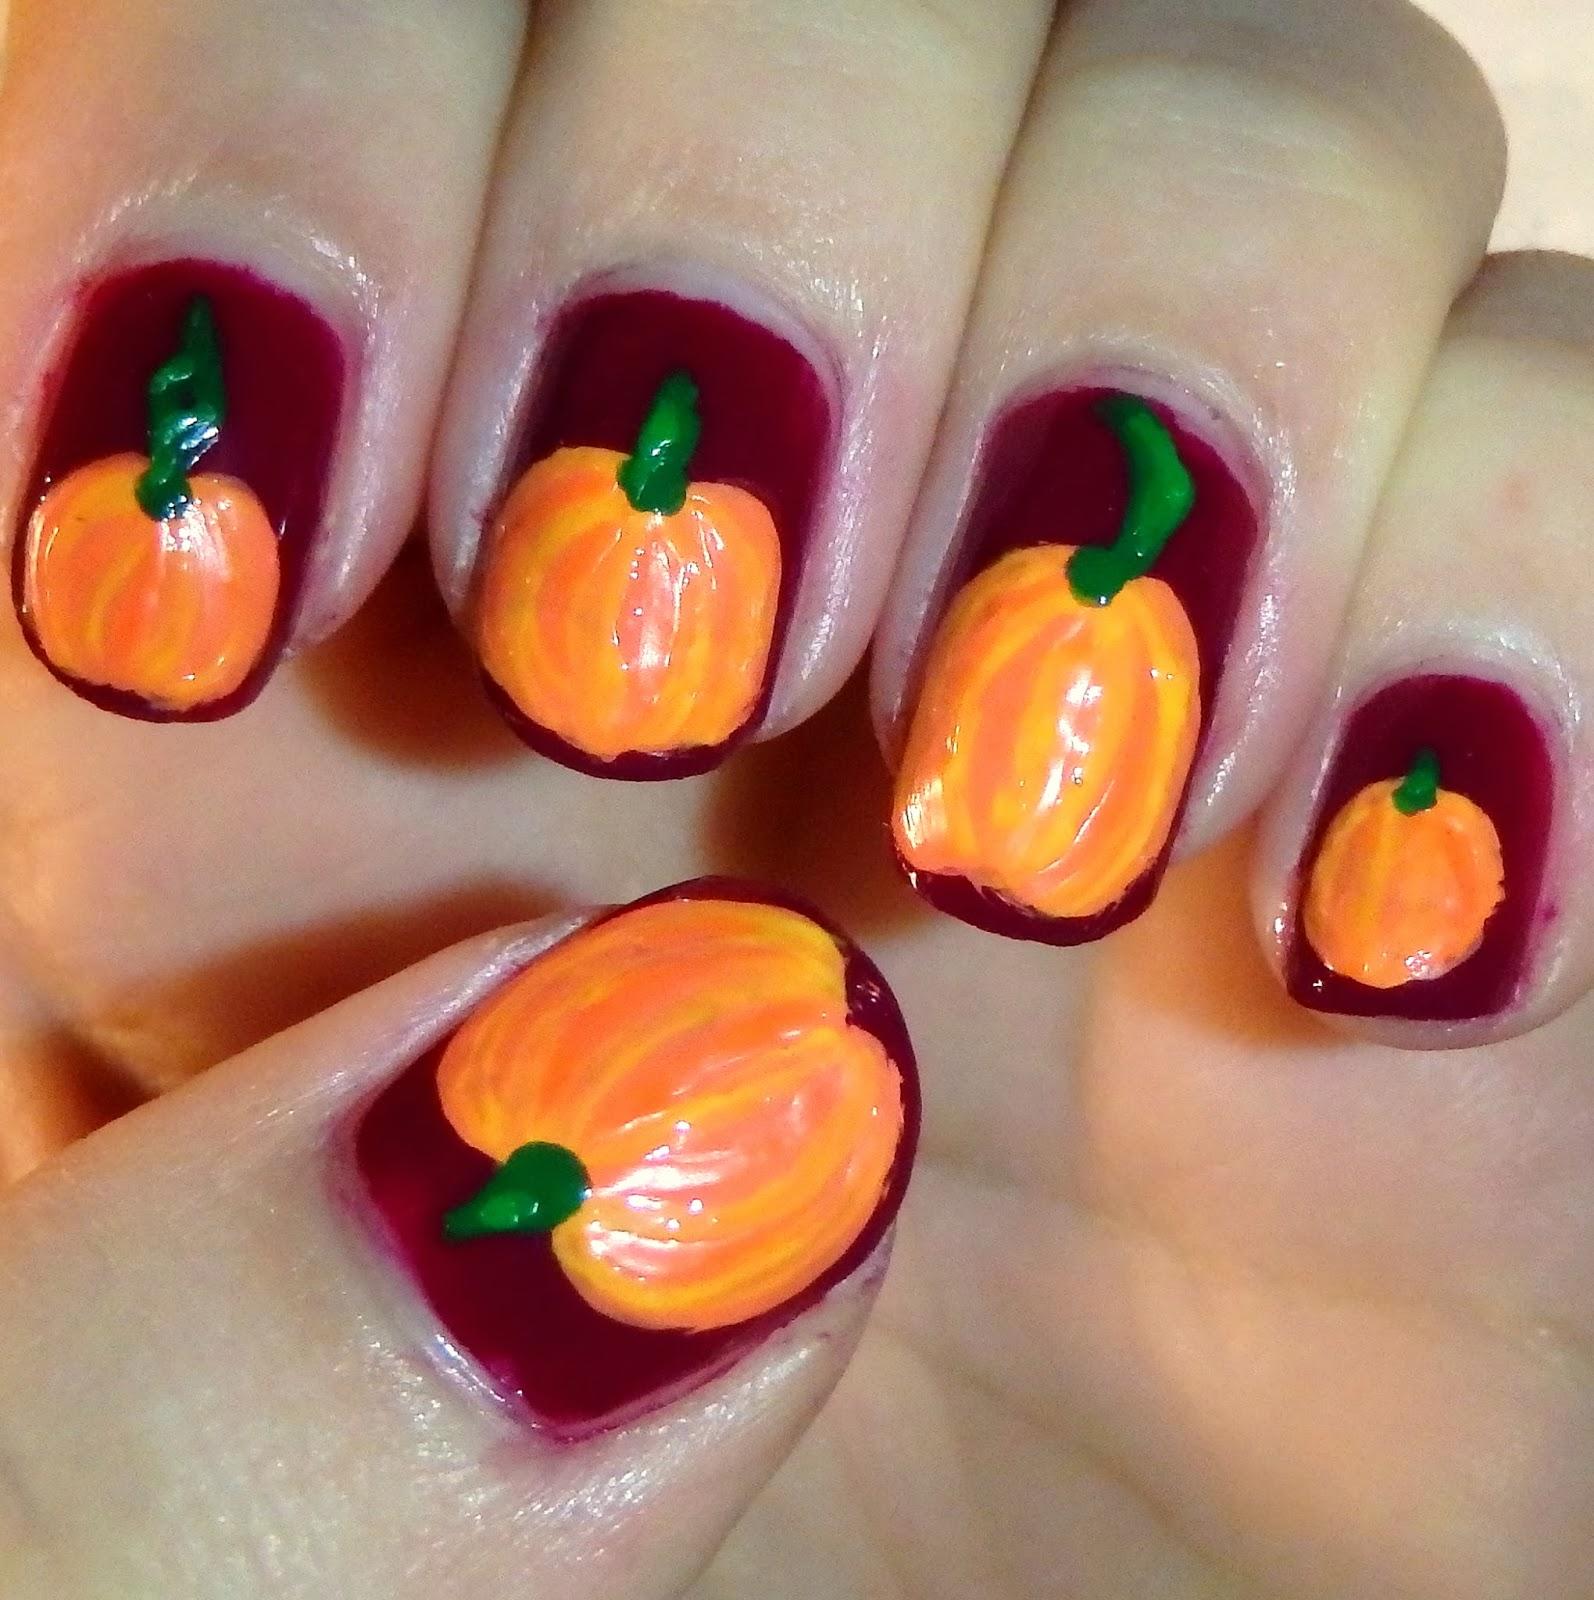 Quixii\'s Nails: 10/20/13 - Pumpkin Jack\'o\'Lanterns